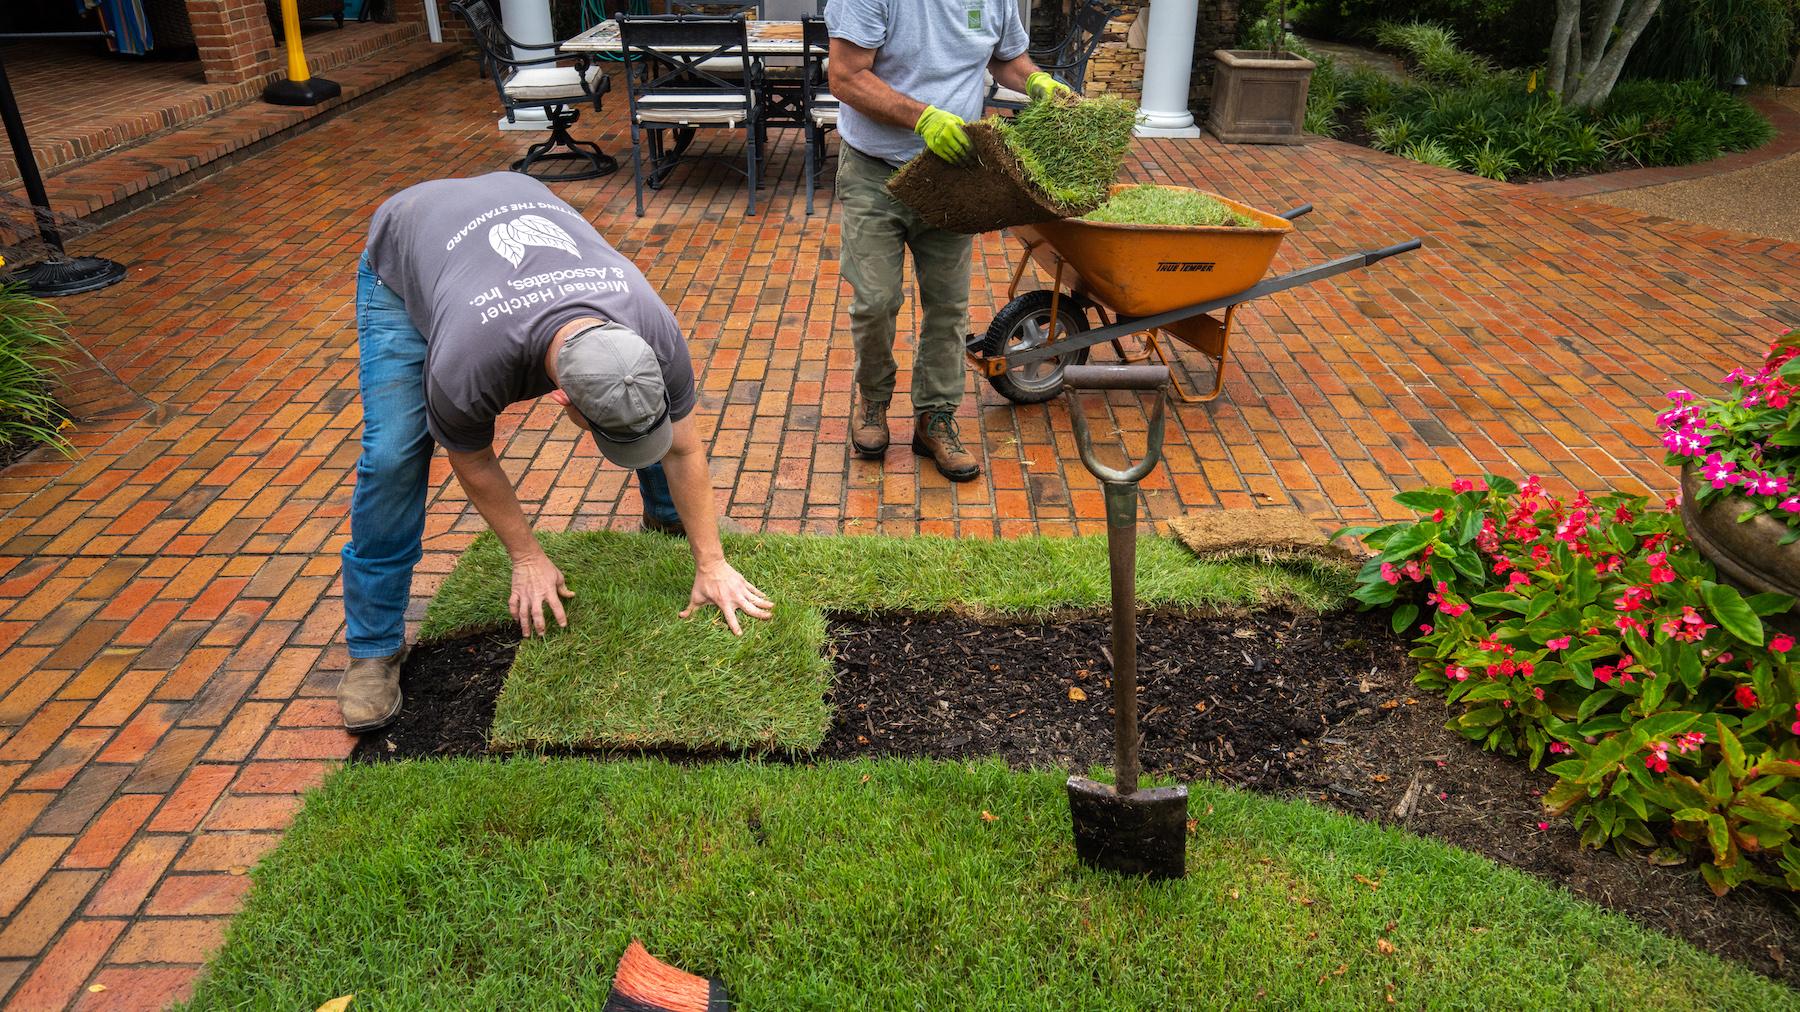 Lawn care technician installing sod